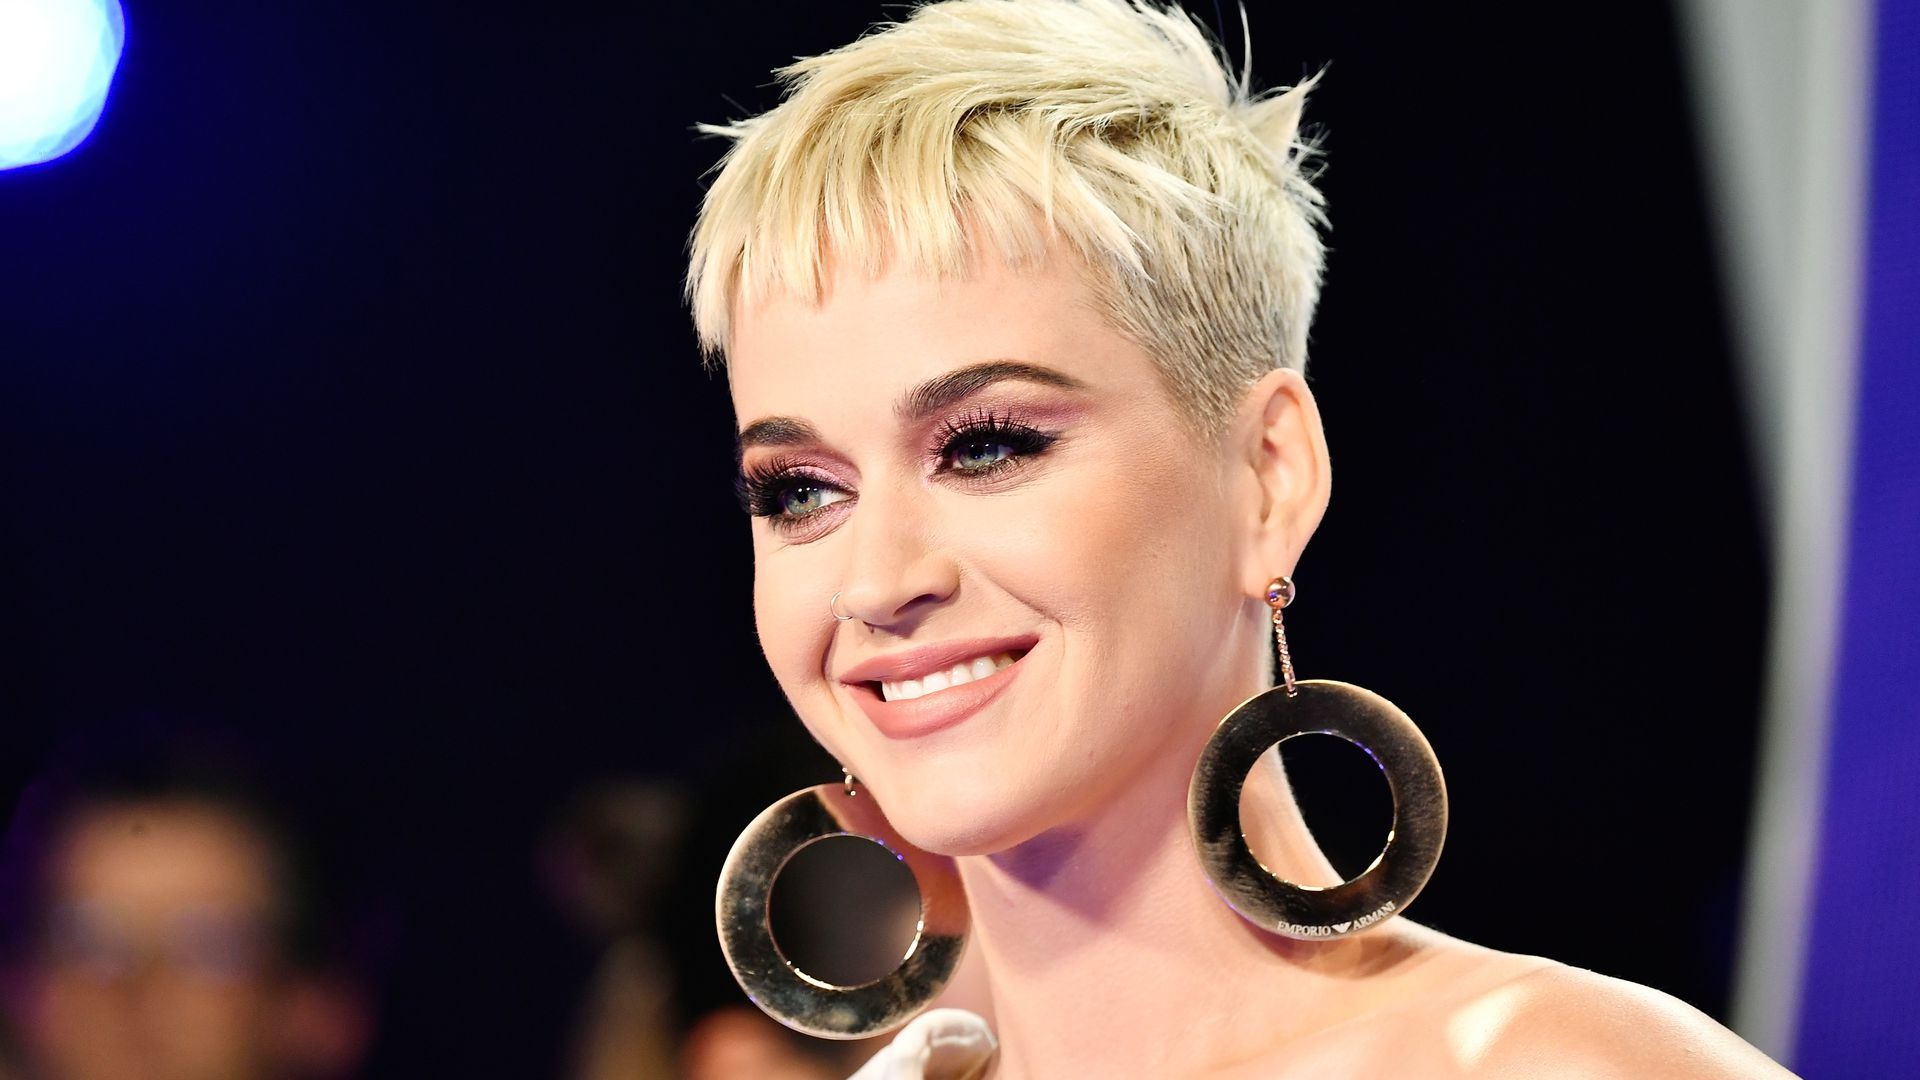 Schwangere Katy Perry ist in neuem Musikvideo komplett